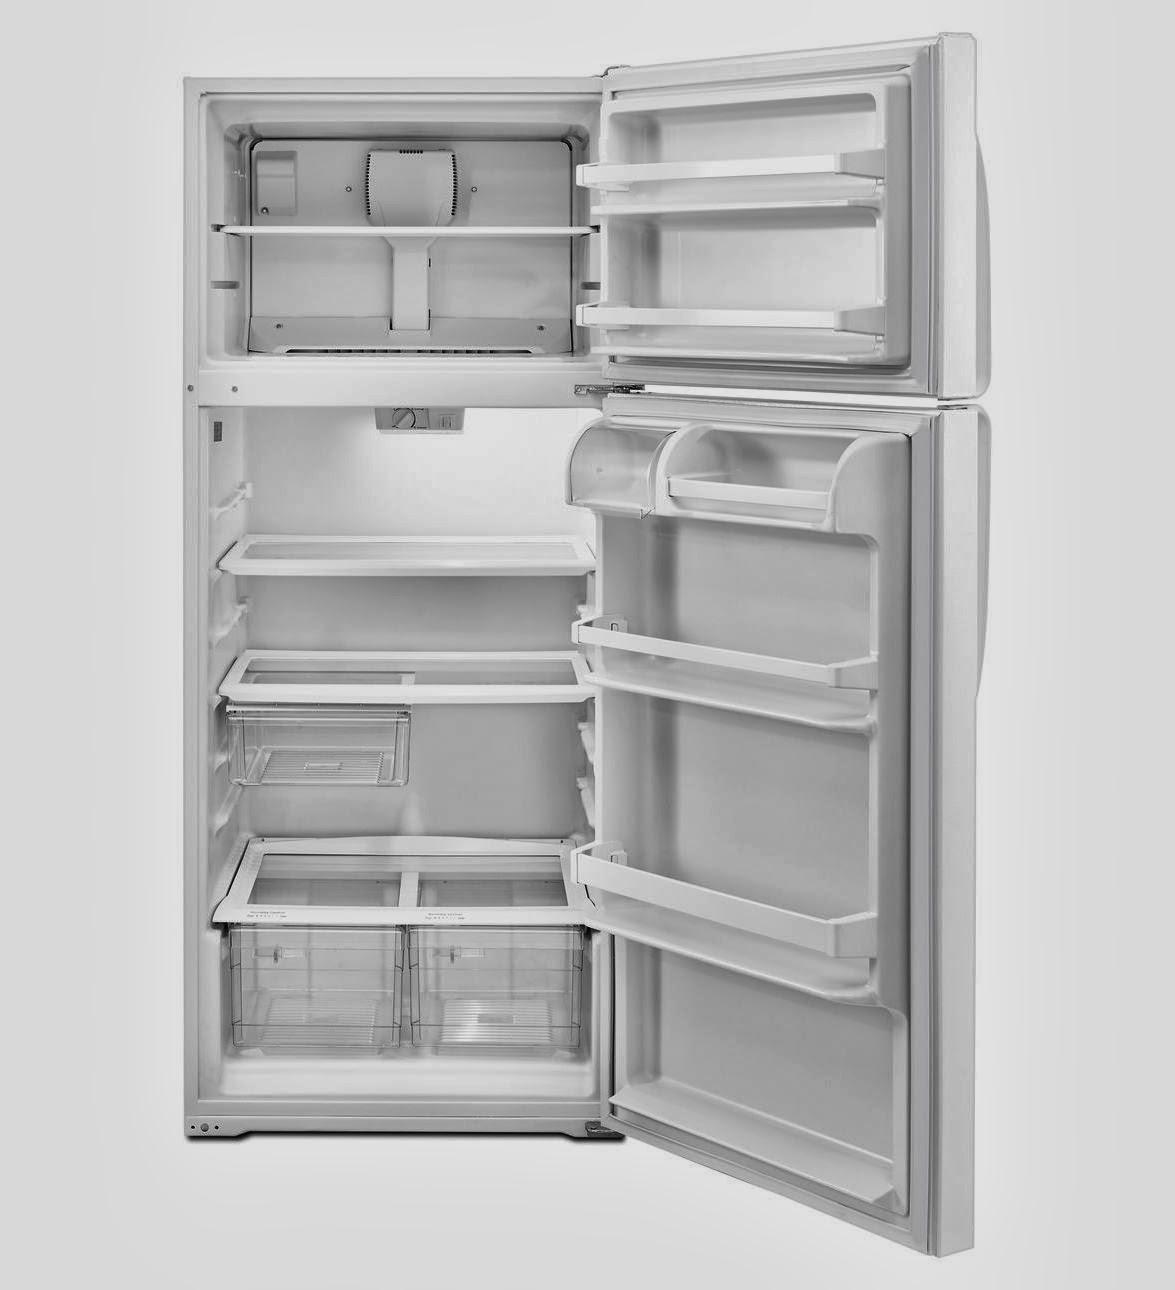 Whirlpool Refrigerator Brand Whirlpool W8txngzbq